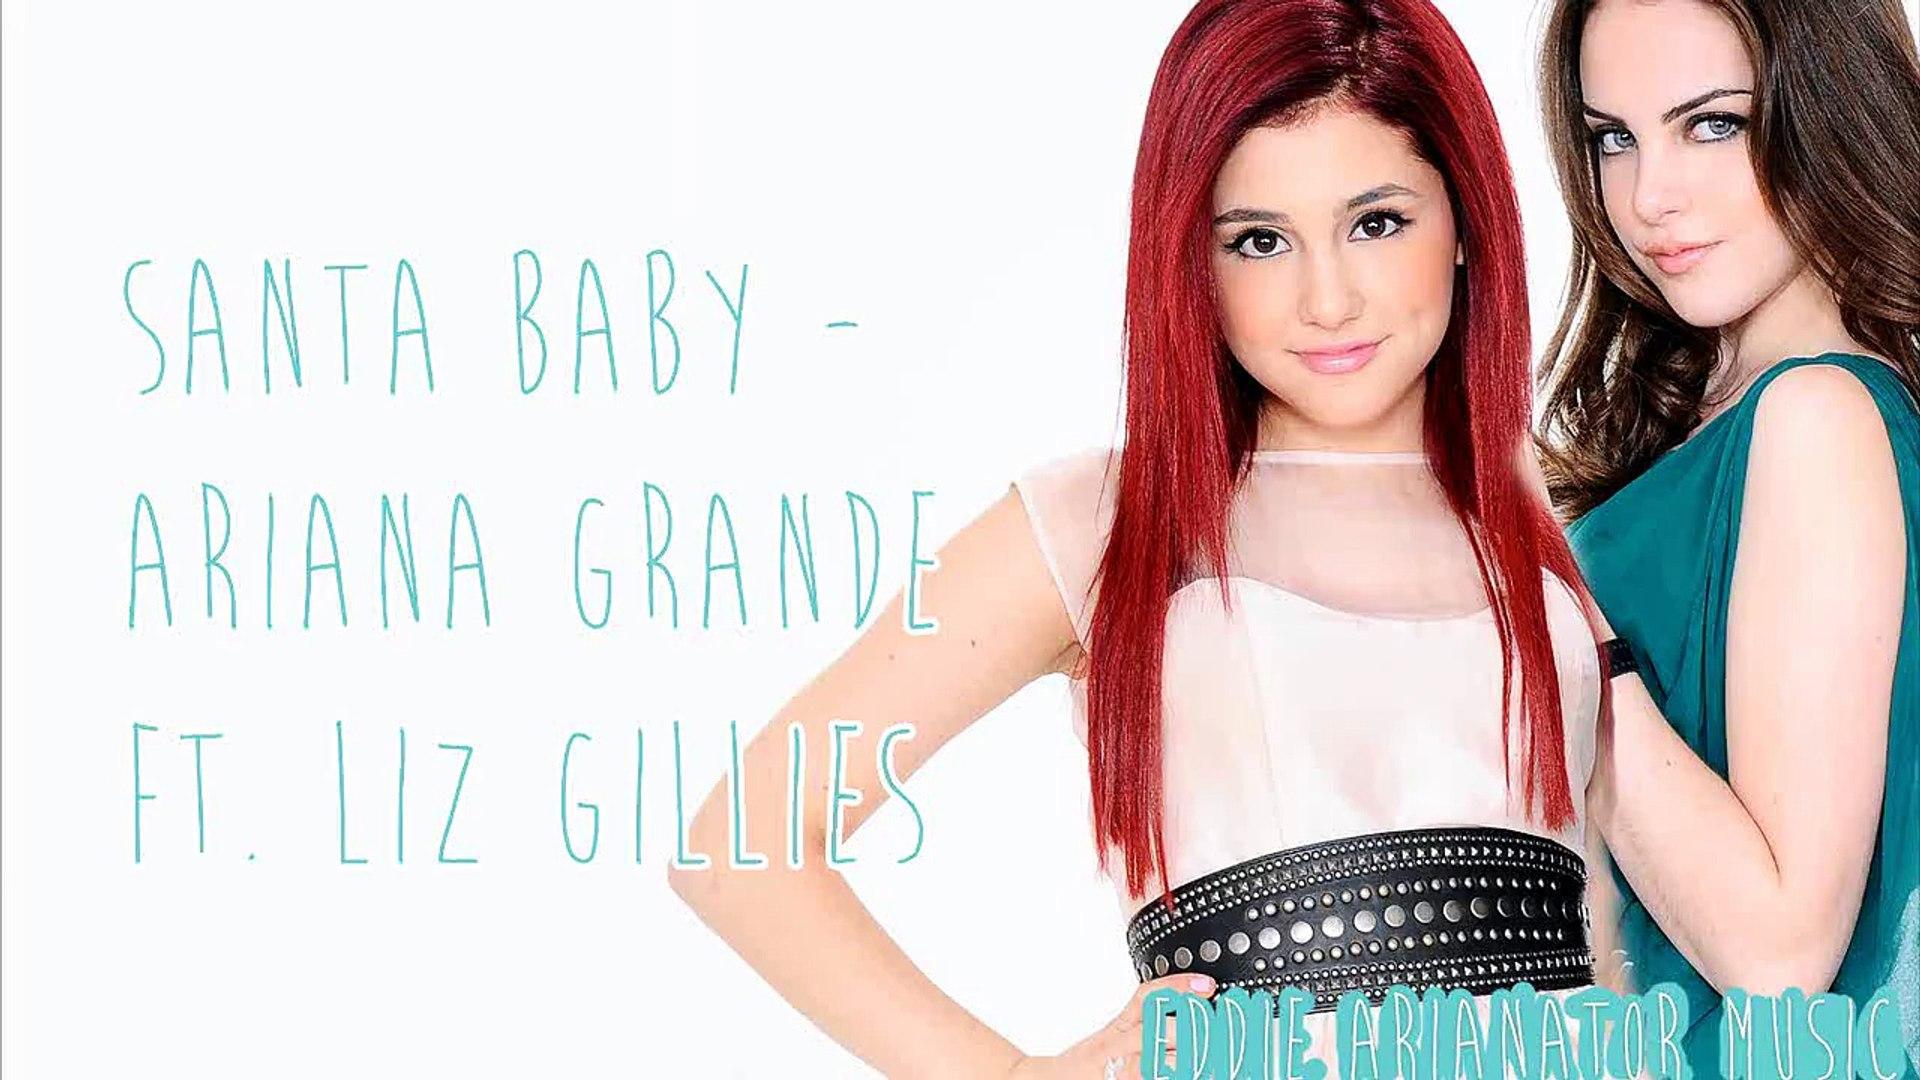 Ariana grande kiss elizabeth gillies victorius ariana